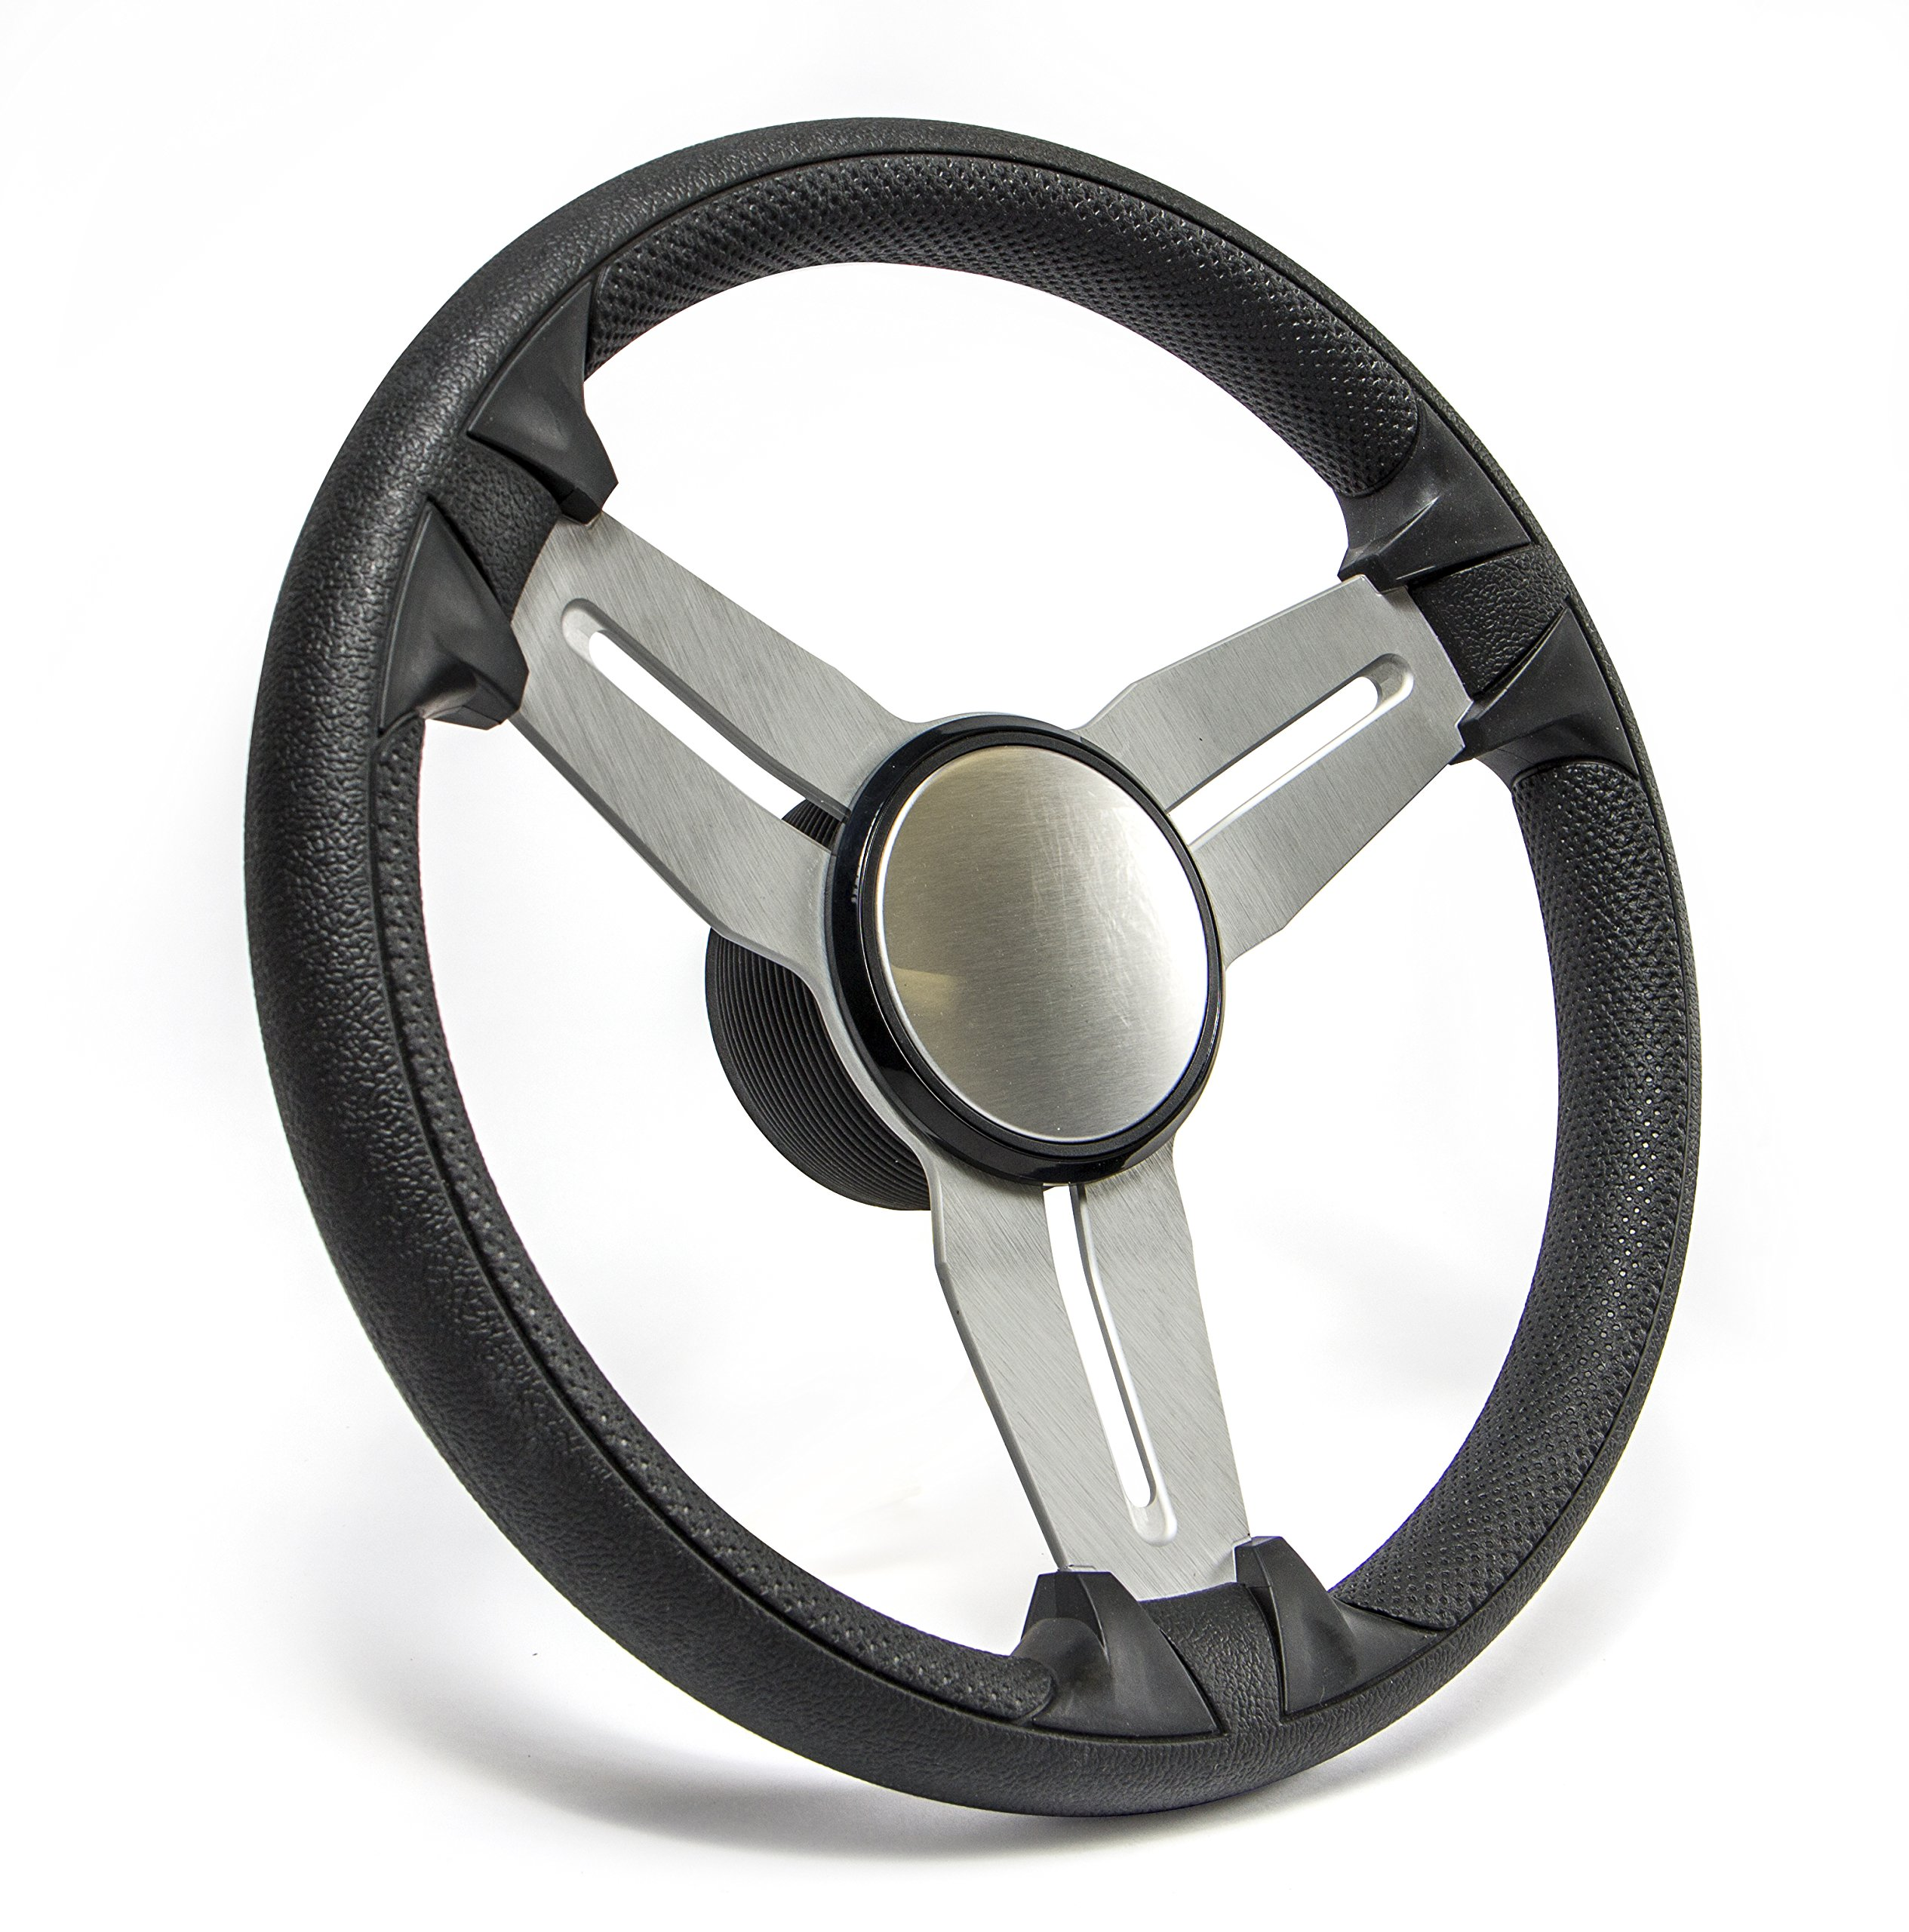 SeaStar Commander SW60900P Steering Wheel, Commander 13-1/2 inch, 3 Spoke Equidistant by SeaStar